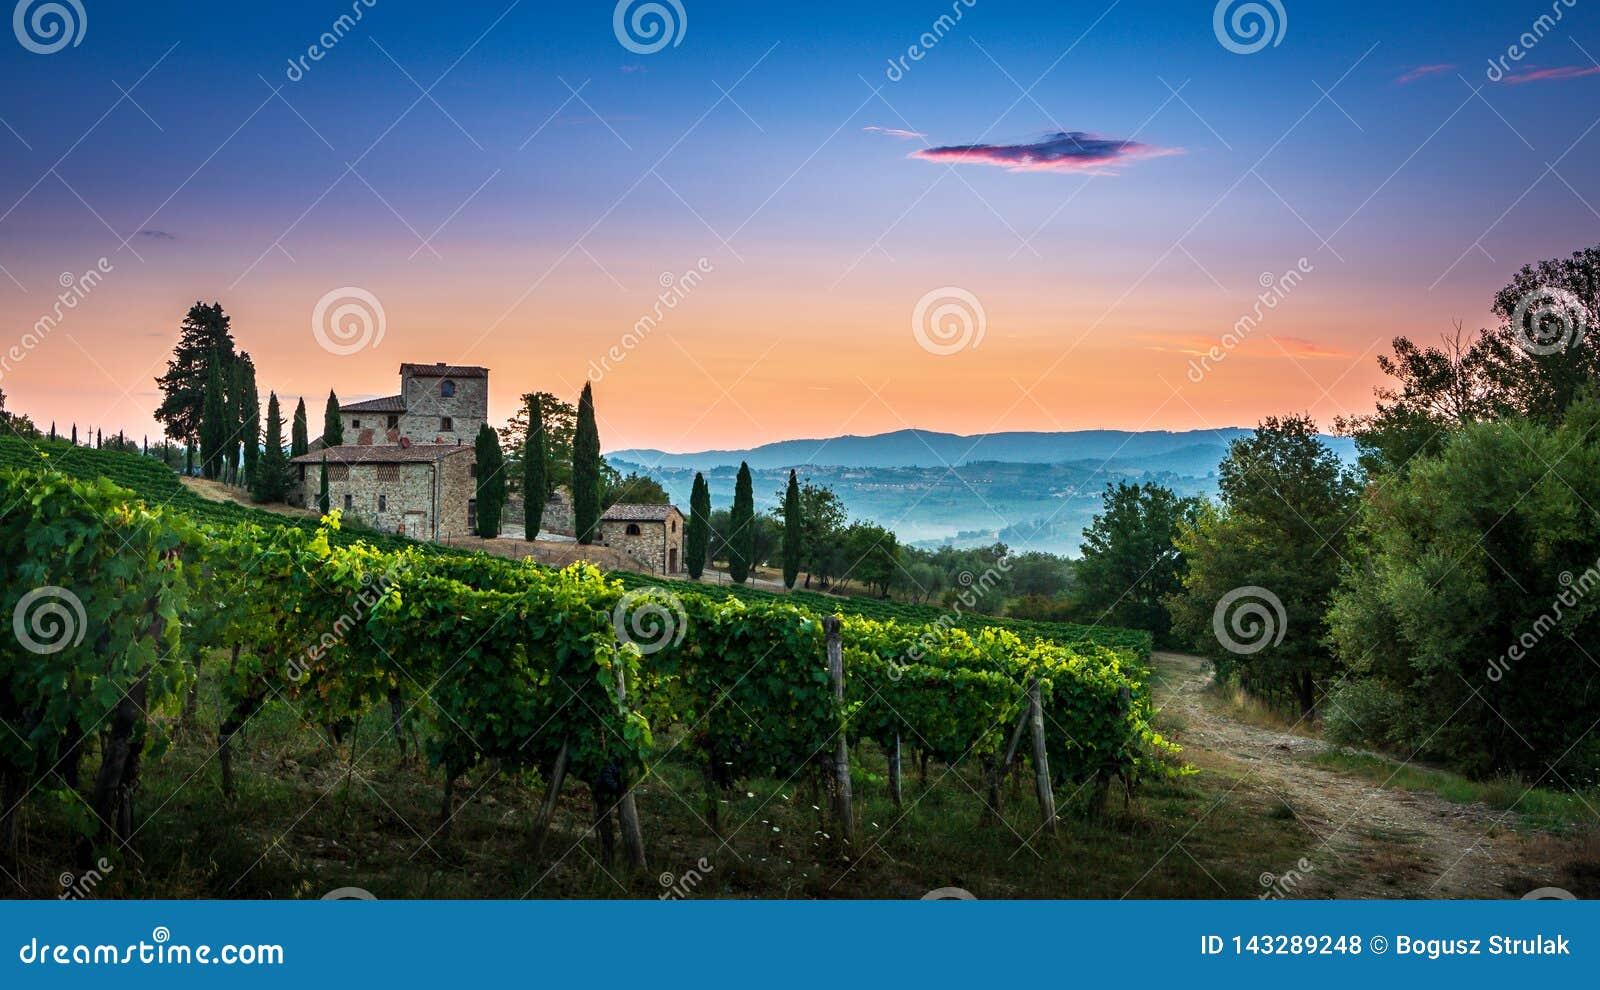 Panorama des toskanischen Weinbergs umfasst im Nebel an der Dämmerung nahe Castellina im Chianti, Italien